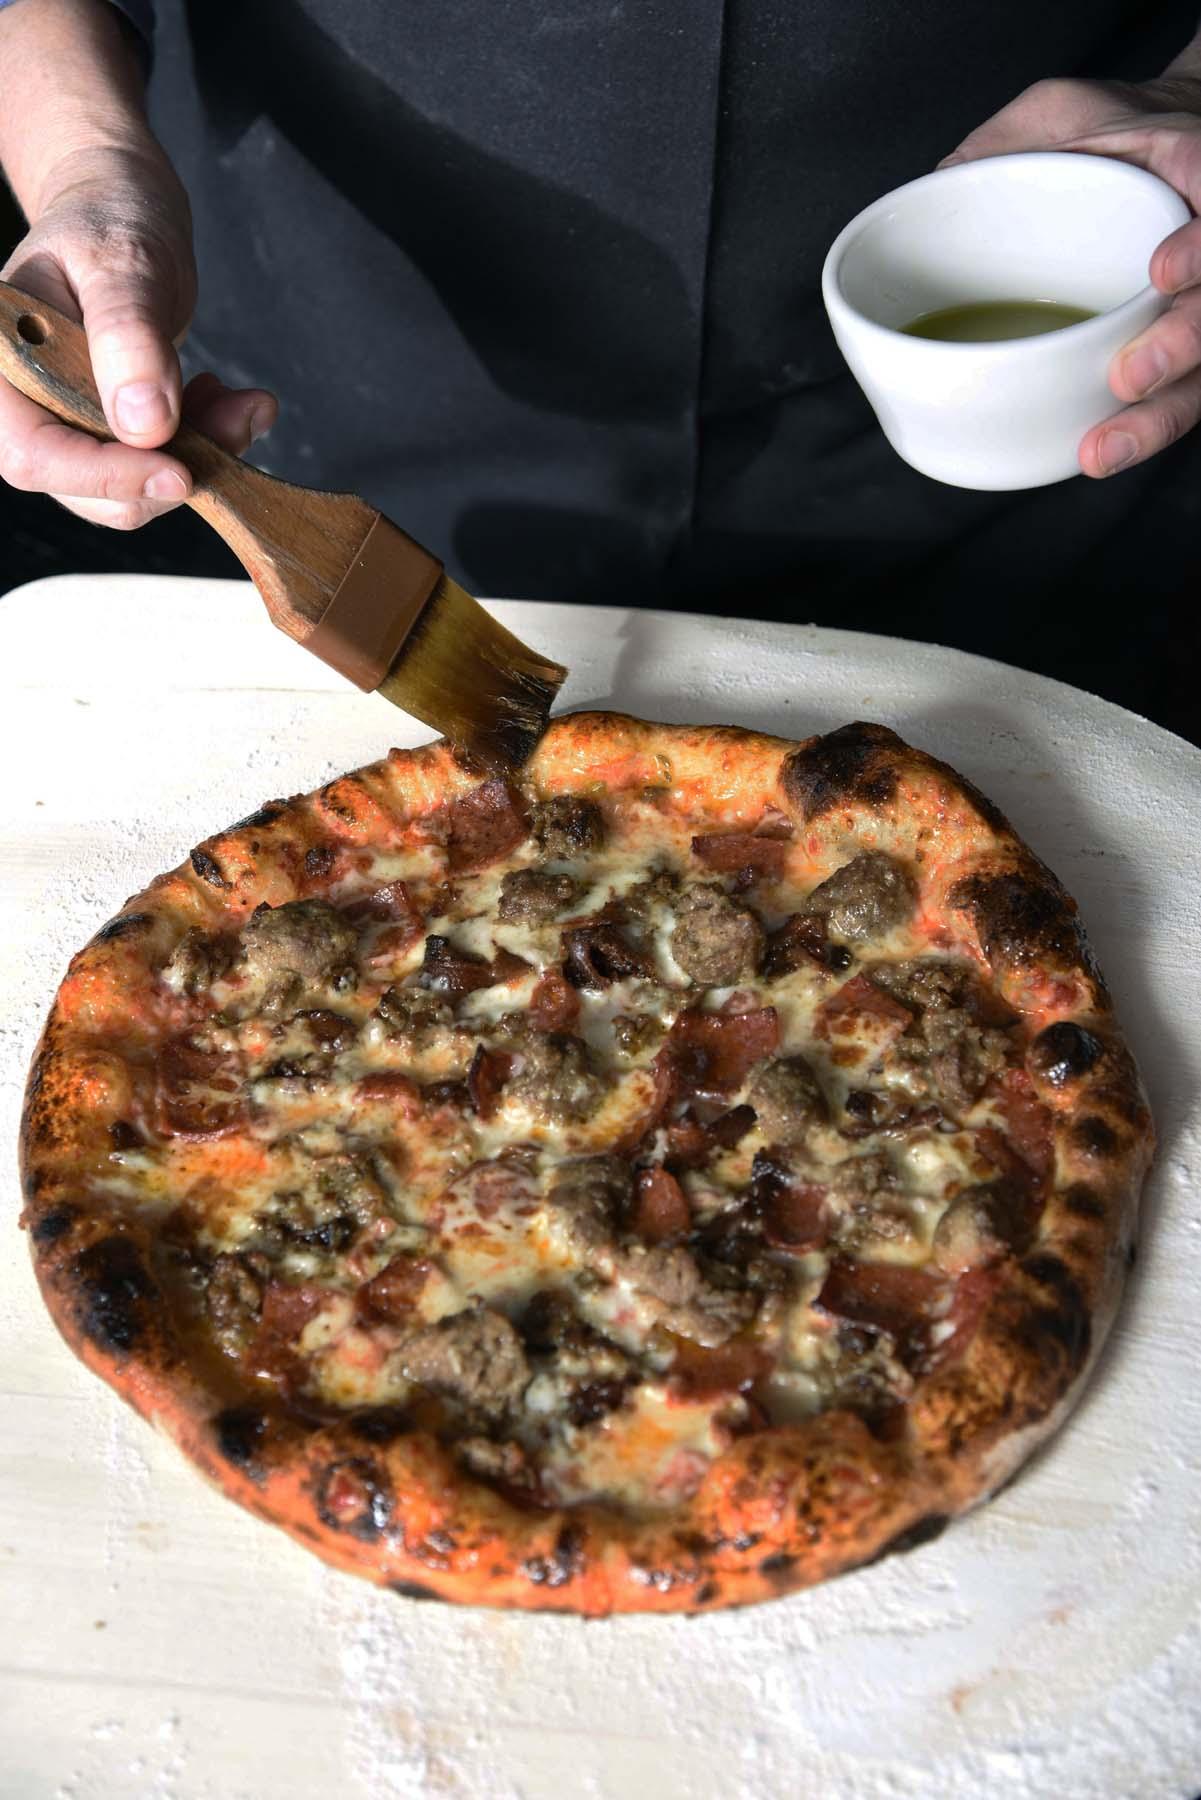 Coals-Artisan-Pizza-Louisville05.jpg